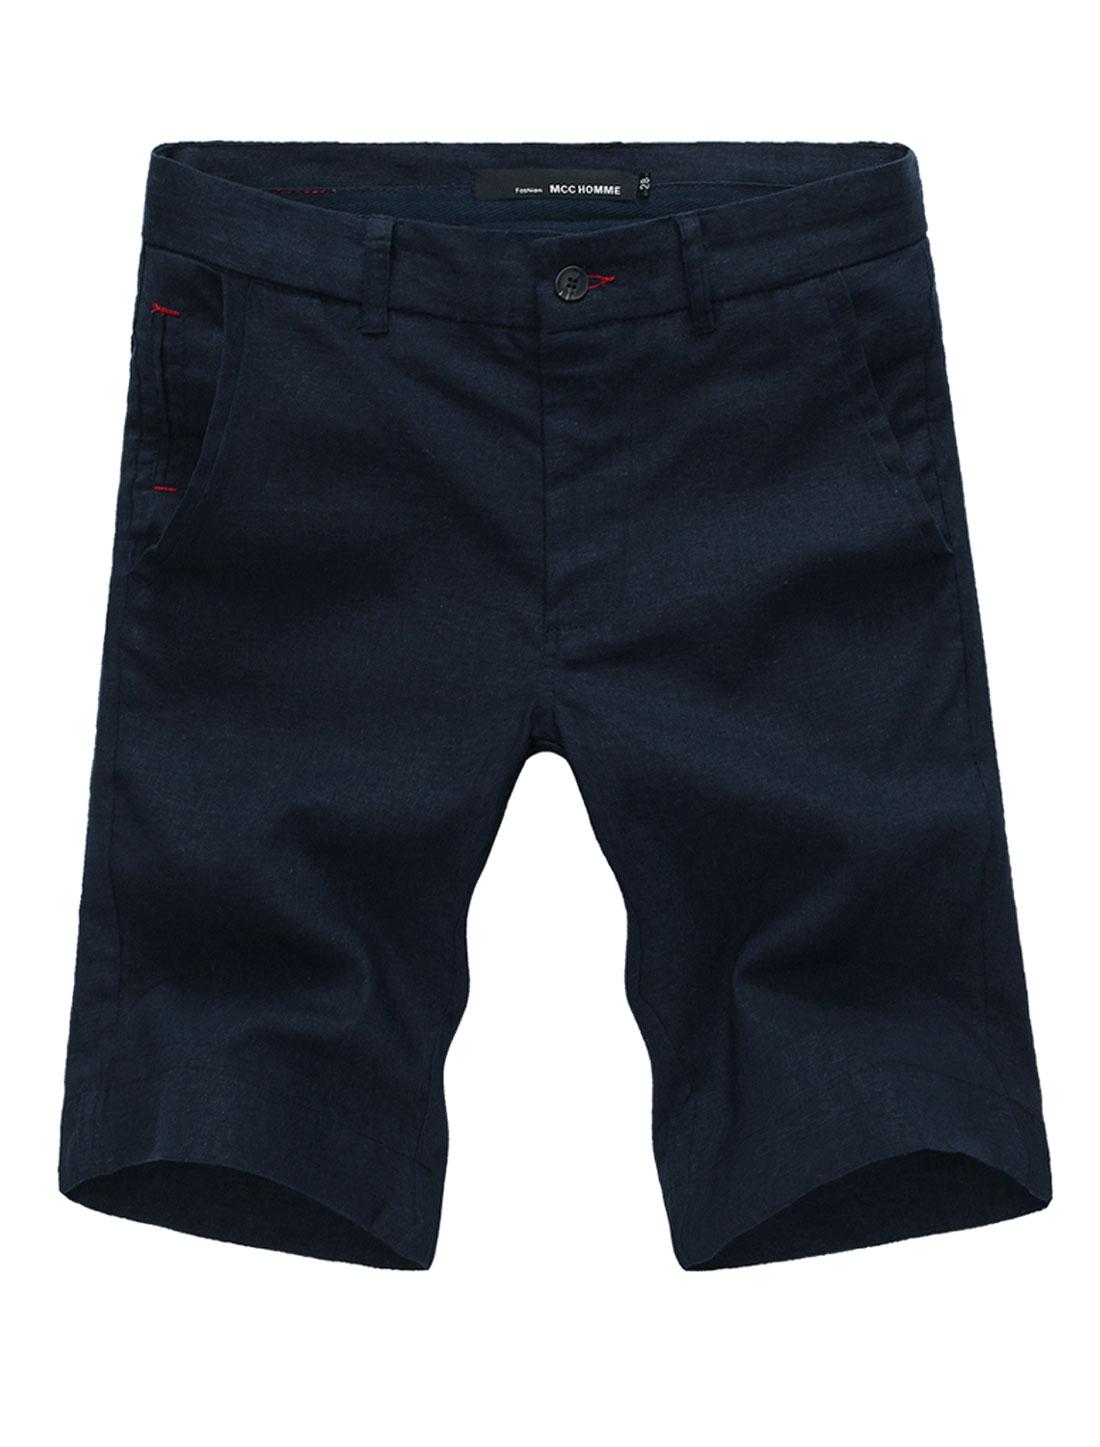 Men Button Closure One Fake Pocket Front Leisure Linen Shorts Navy Blue W34